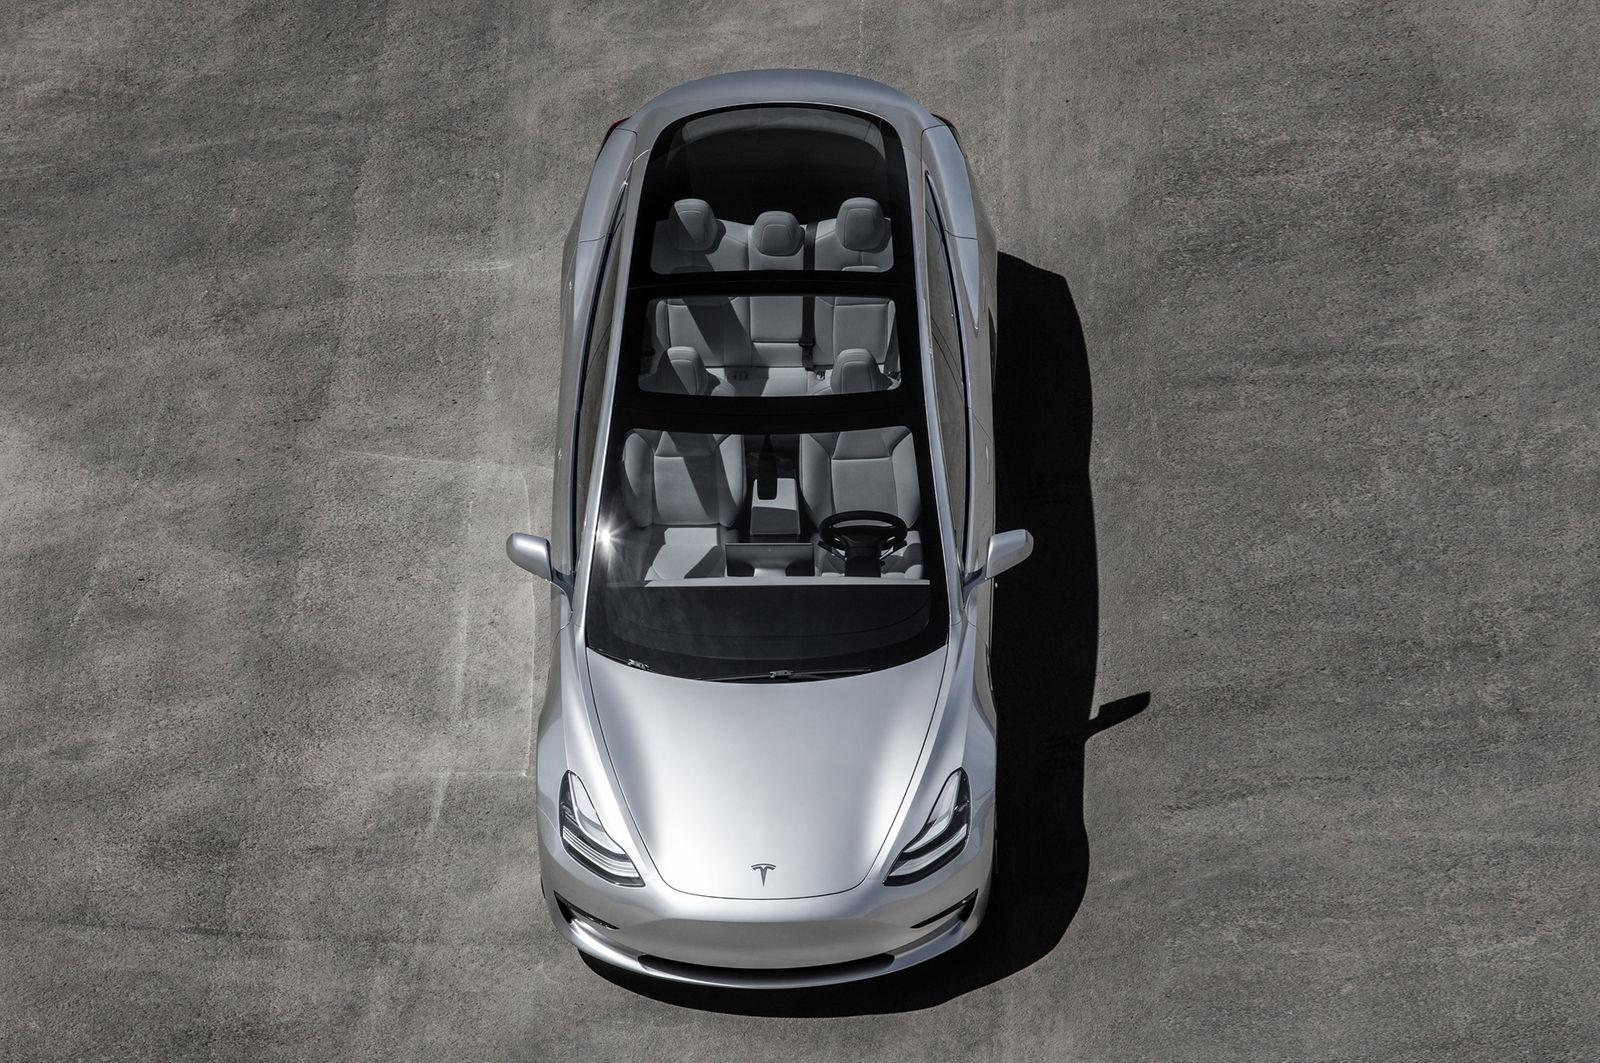 Tesla Model 3. Source: http://model3ownersclub.com